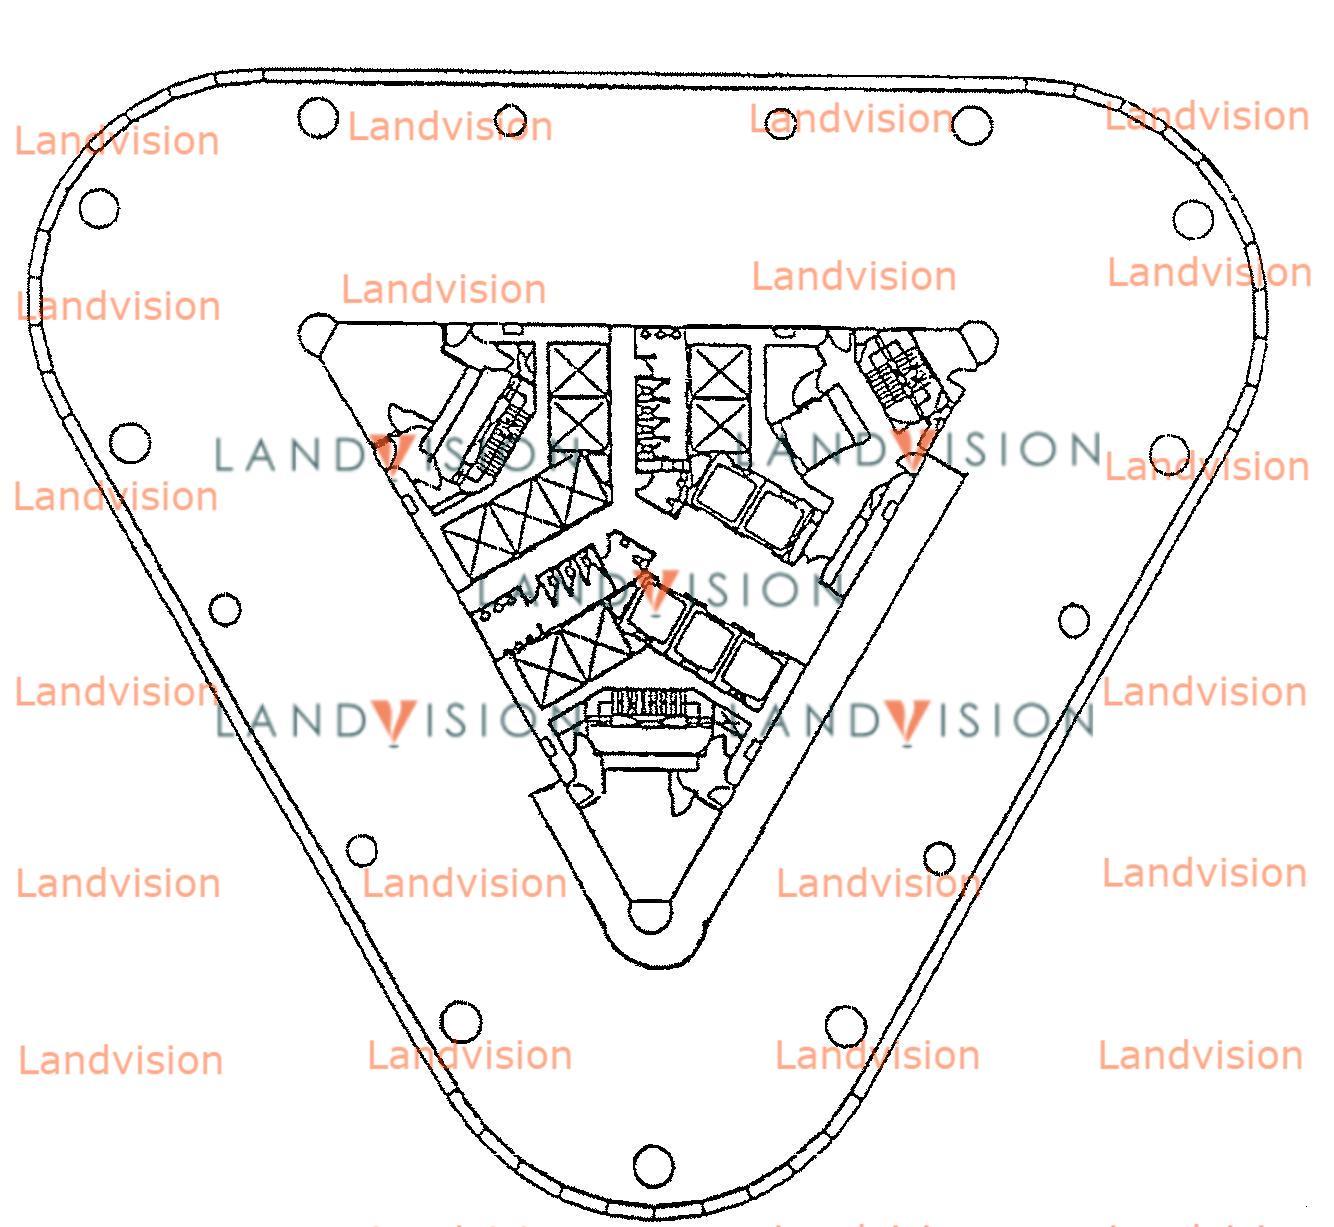 https://www.landvision.com.hk/wp-content/uploads/website/resize/floorplans/000594.JPG